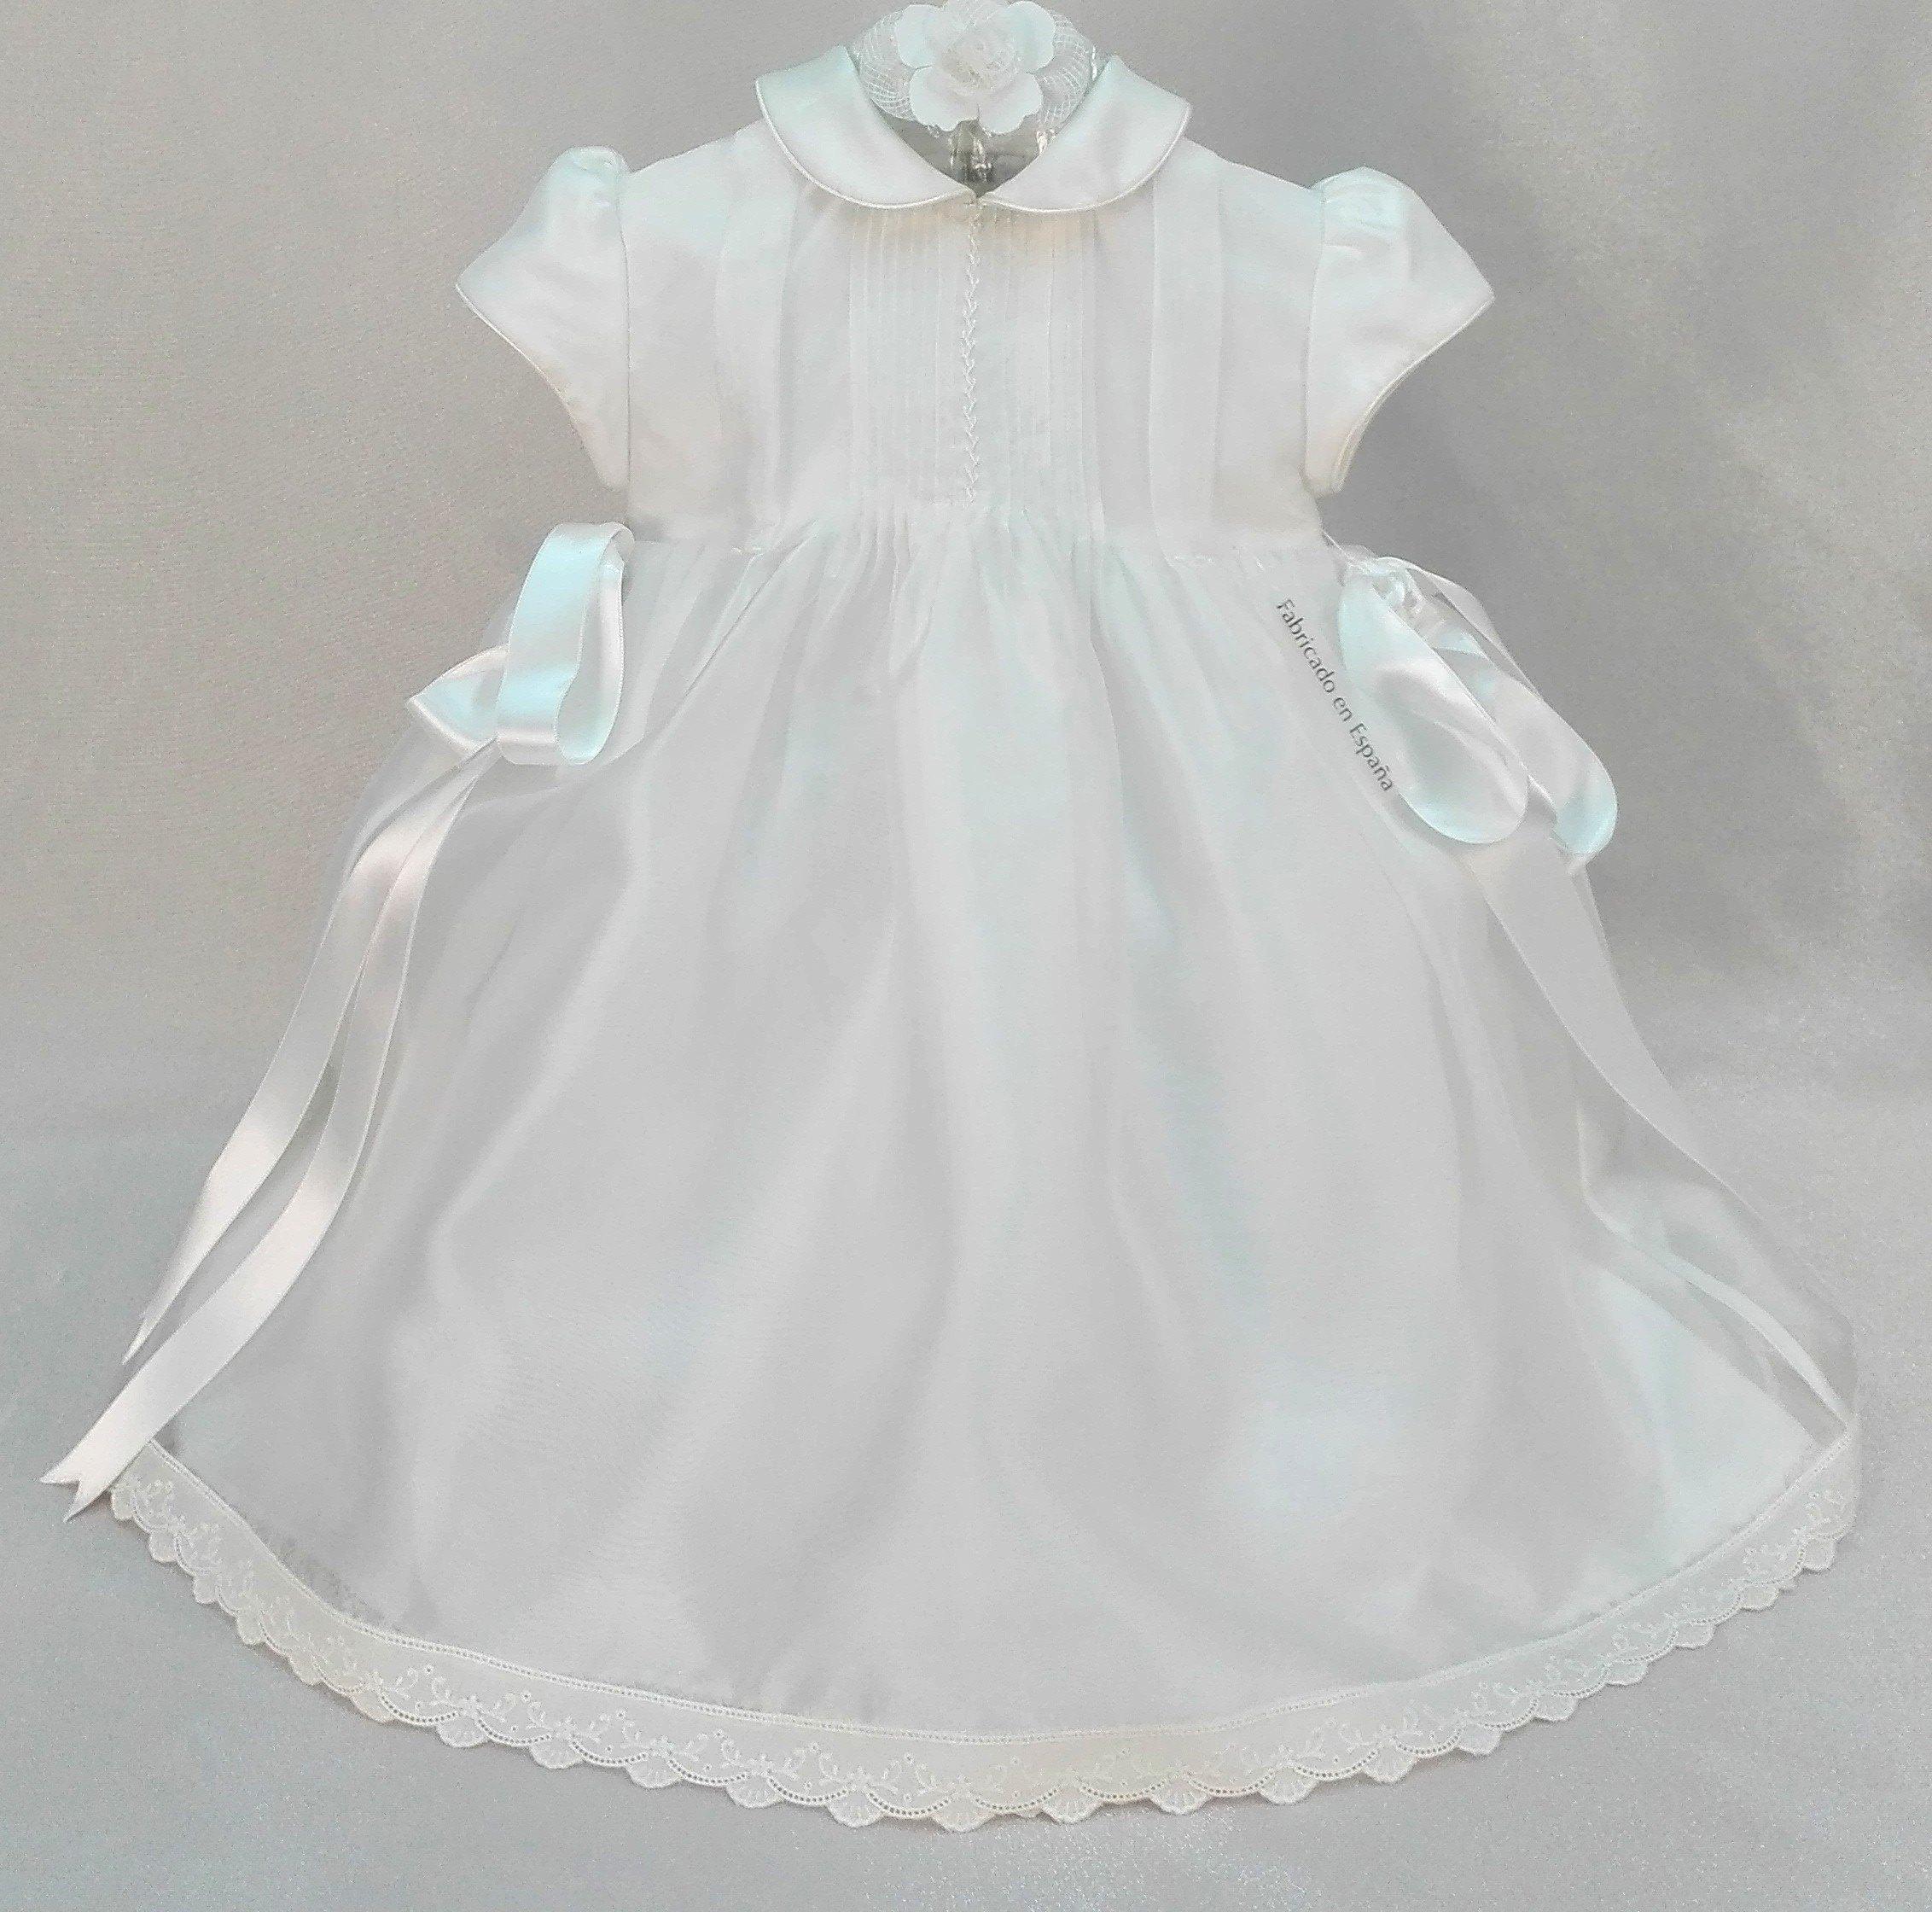 54558811c Vestido bautizo seda marfil - Arca Boutique Infantil-Juvenil